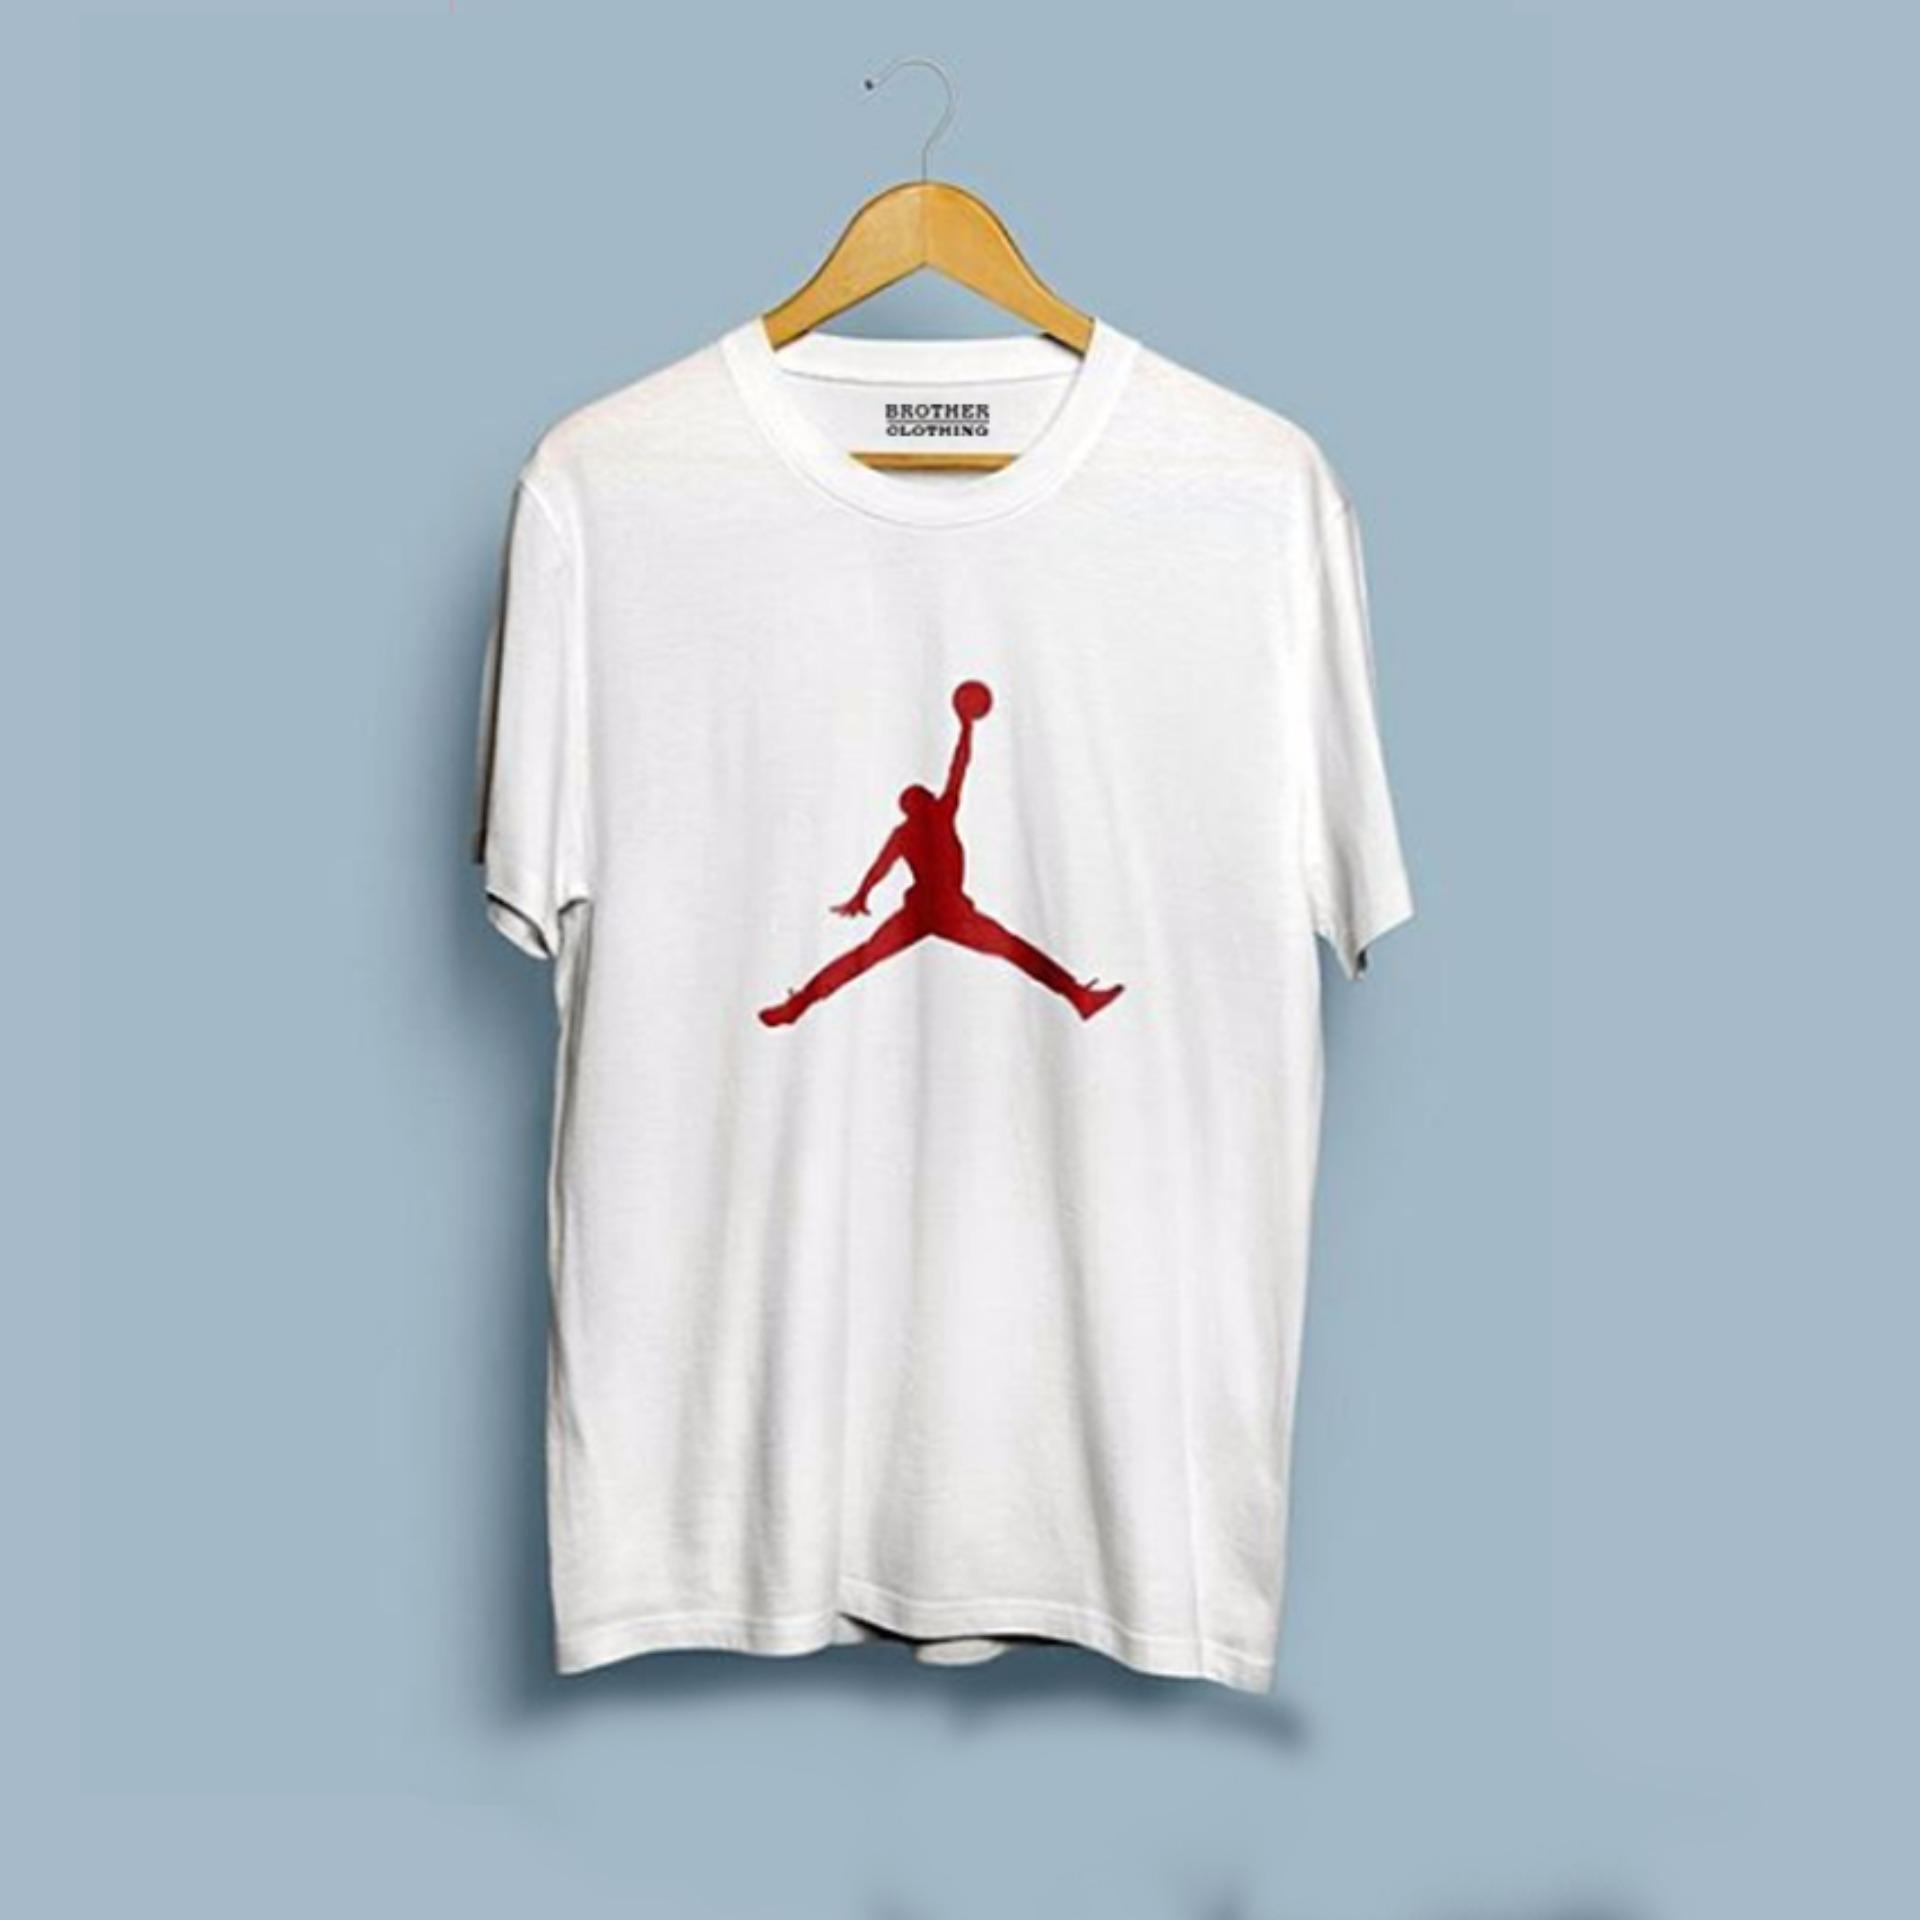 Cocok untuk pria maupun wanita Brother Store Kaos Distro logo Air Jordan  RED-White Premium 86dfb8dc05